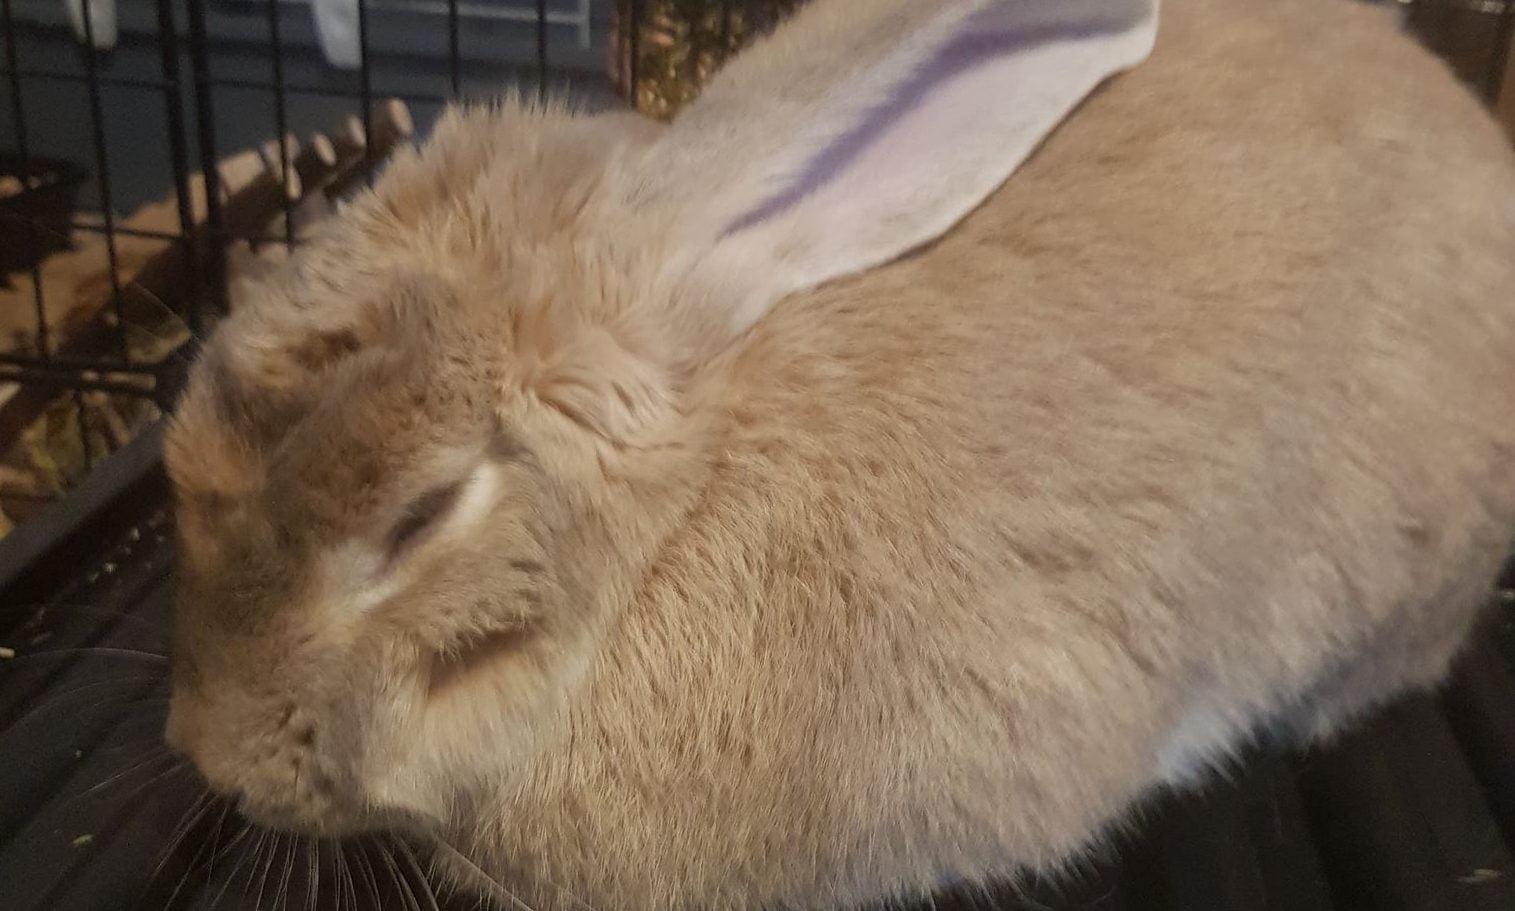 Rabbit sleeping loafed